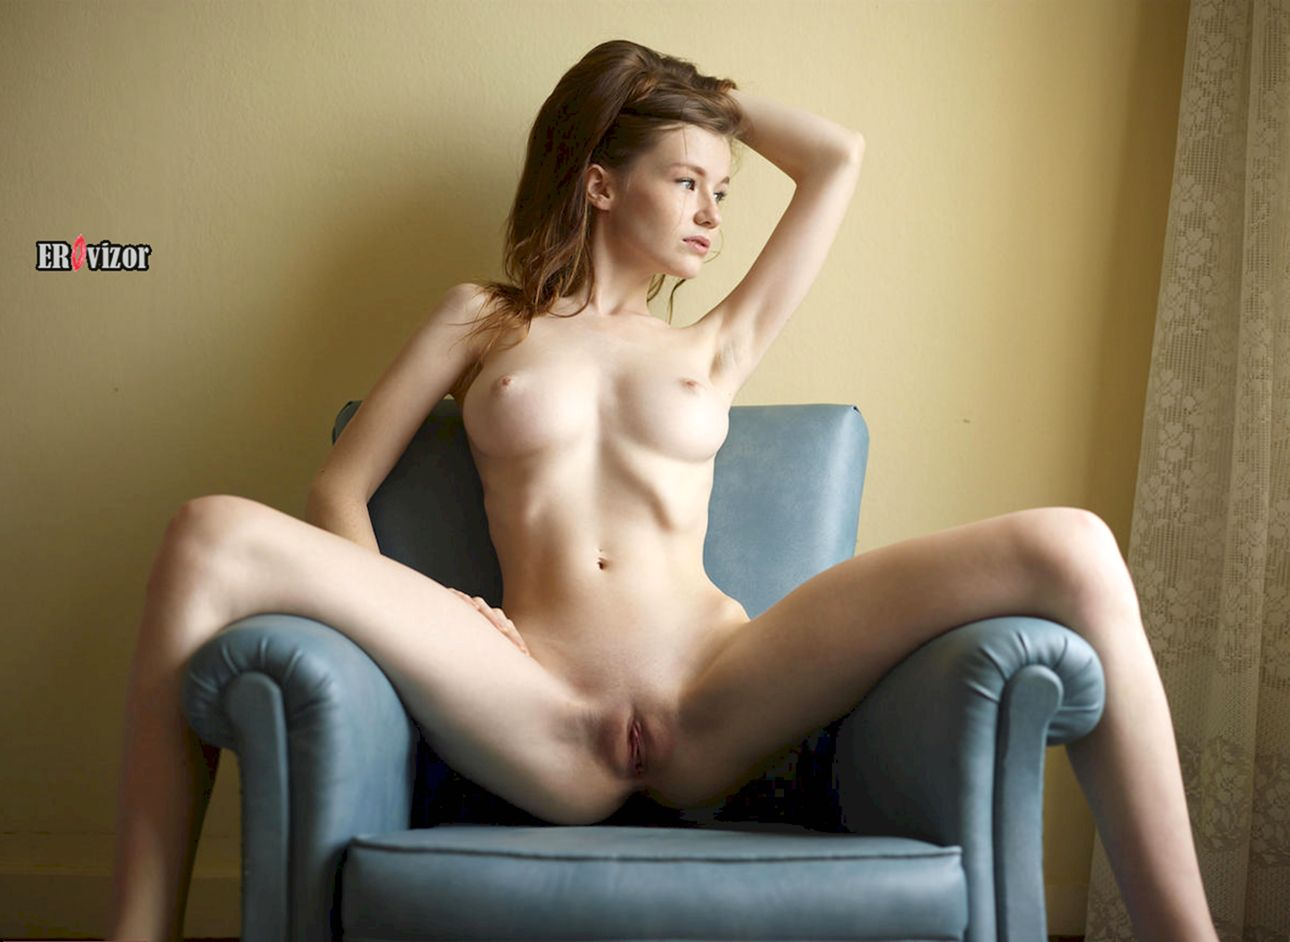 голая Emily Bloom широко раздвинула ноги на кресле